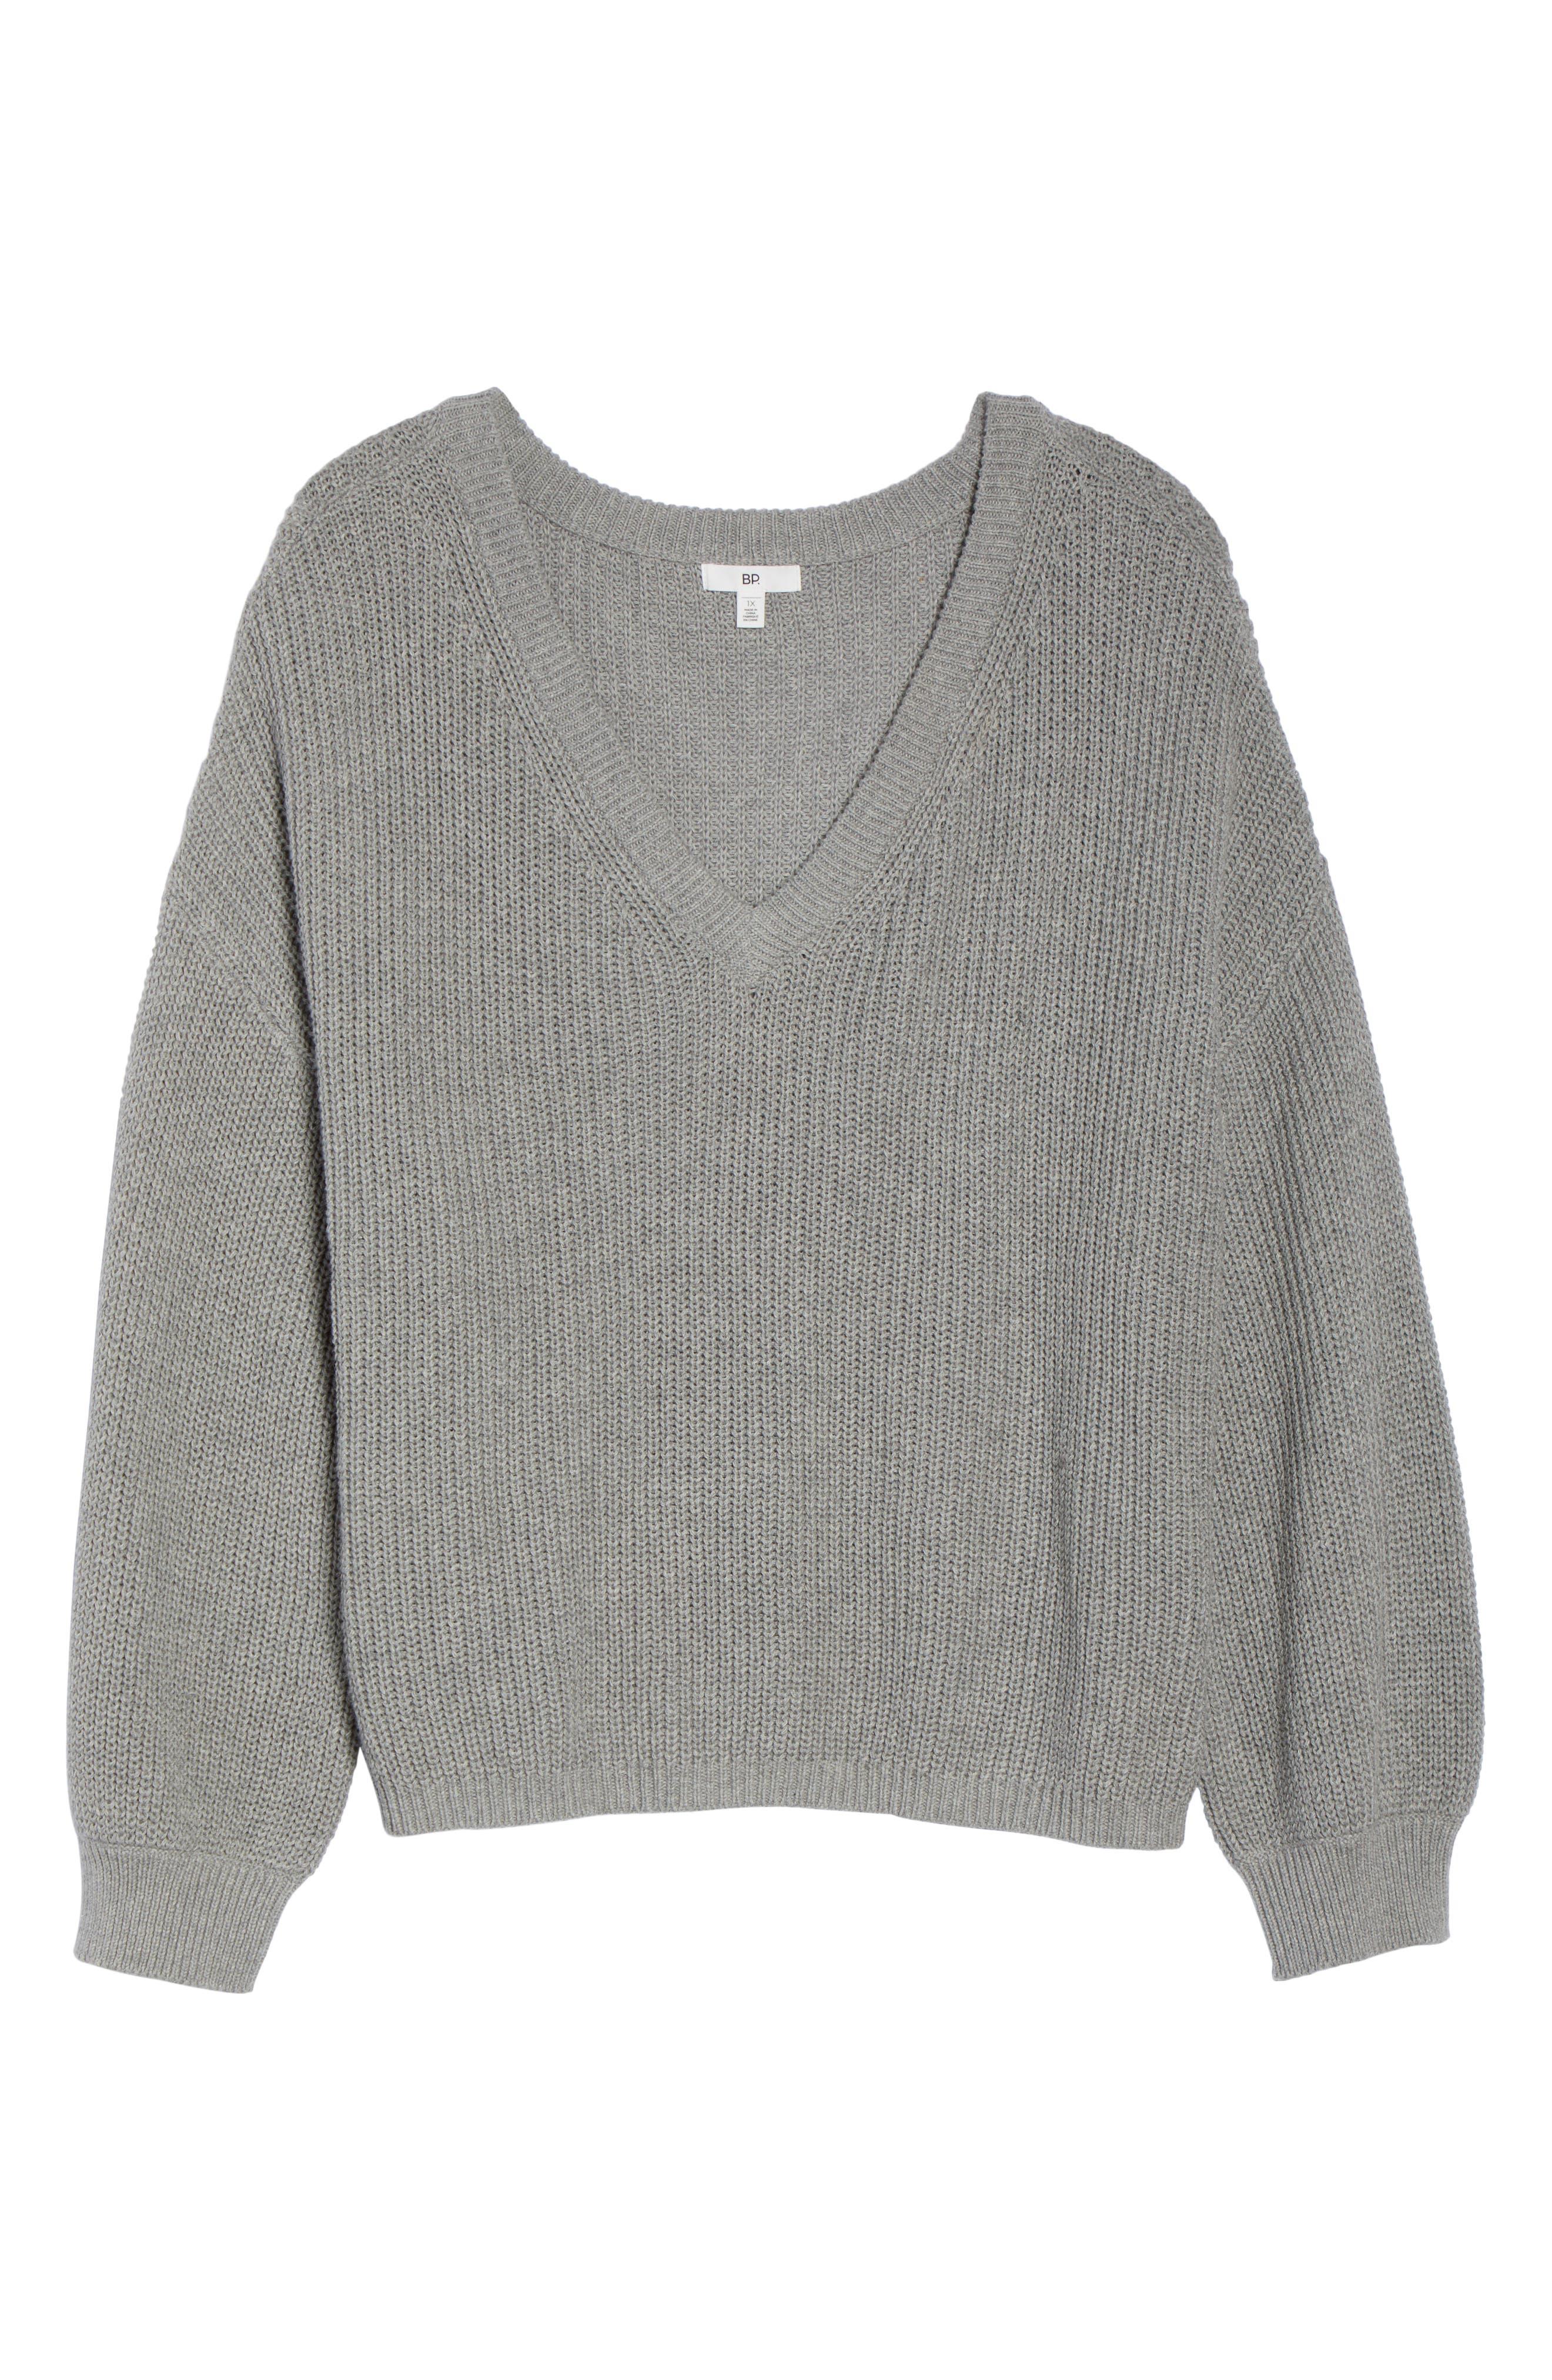 V Neck Cotton Sweater,                             Alternate thumbnail 11, color,                             030